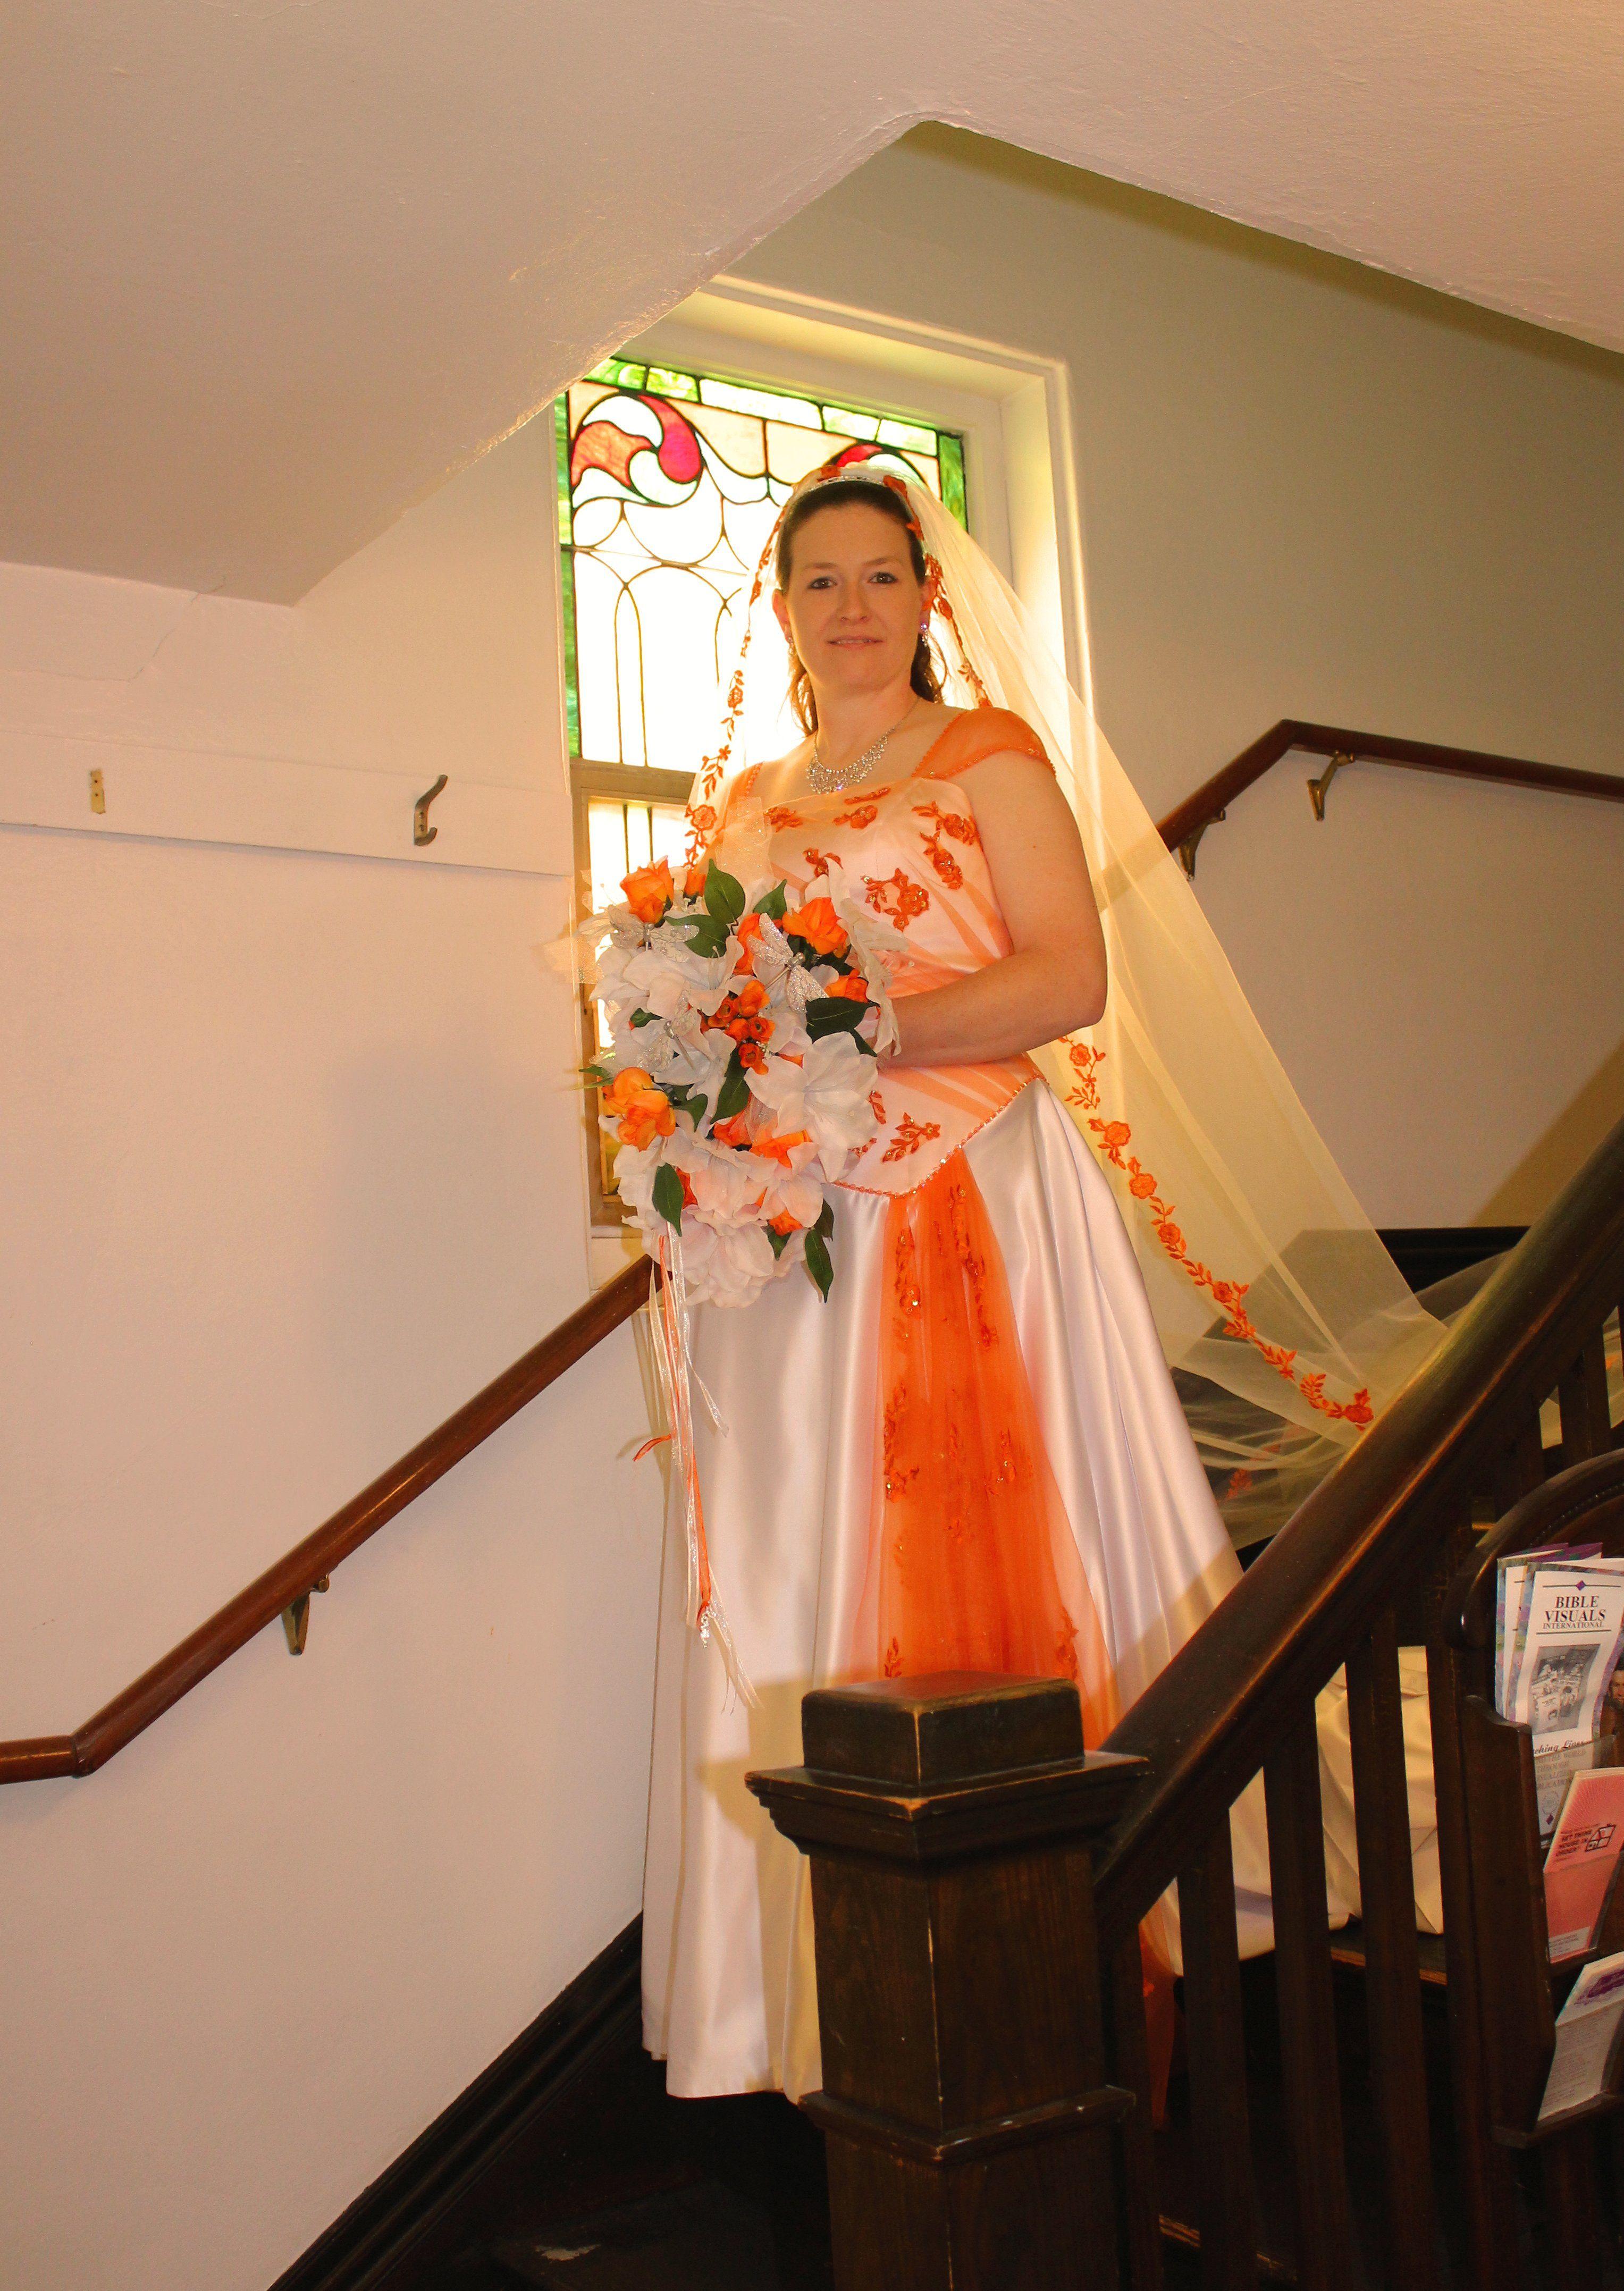 White And Orange Wedding Dress And Veil Non White Wedding Dresses Wedding Dresses White Wedding Dresses [ 4310 x 3055 Pixel ]